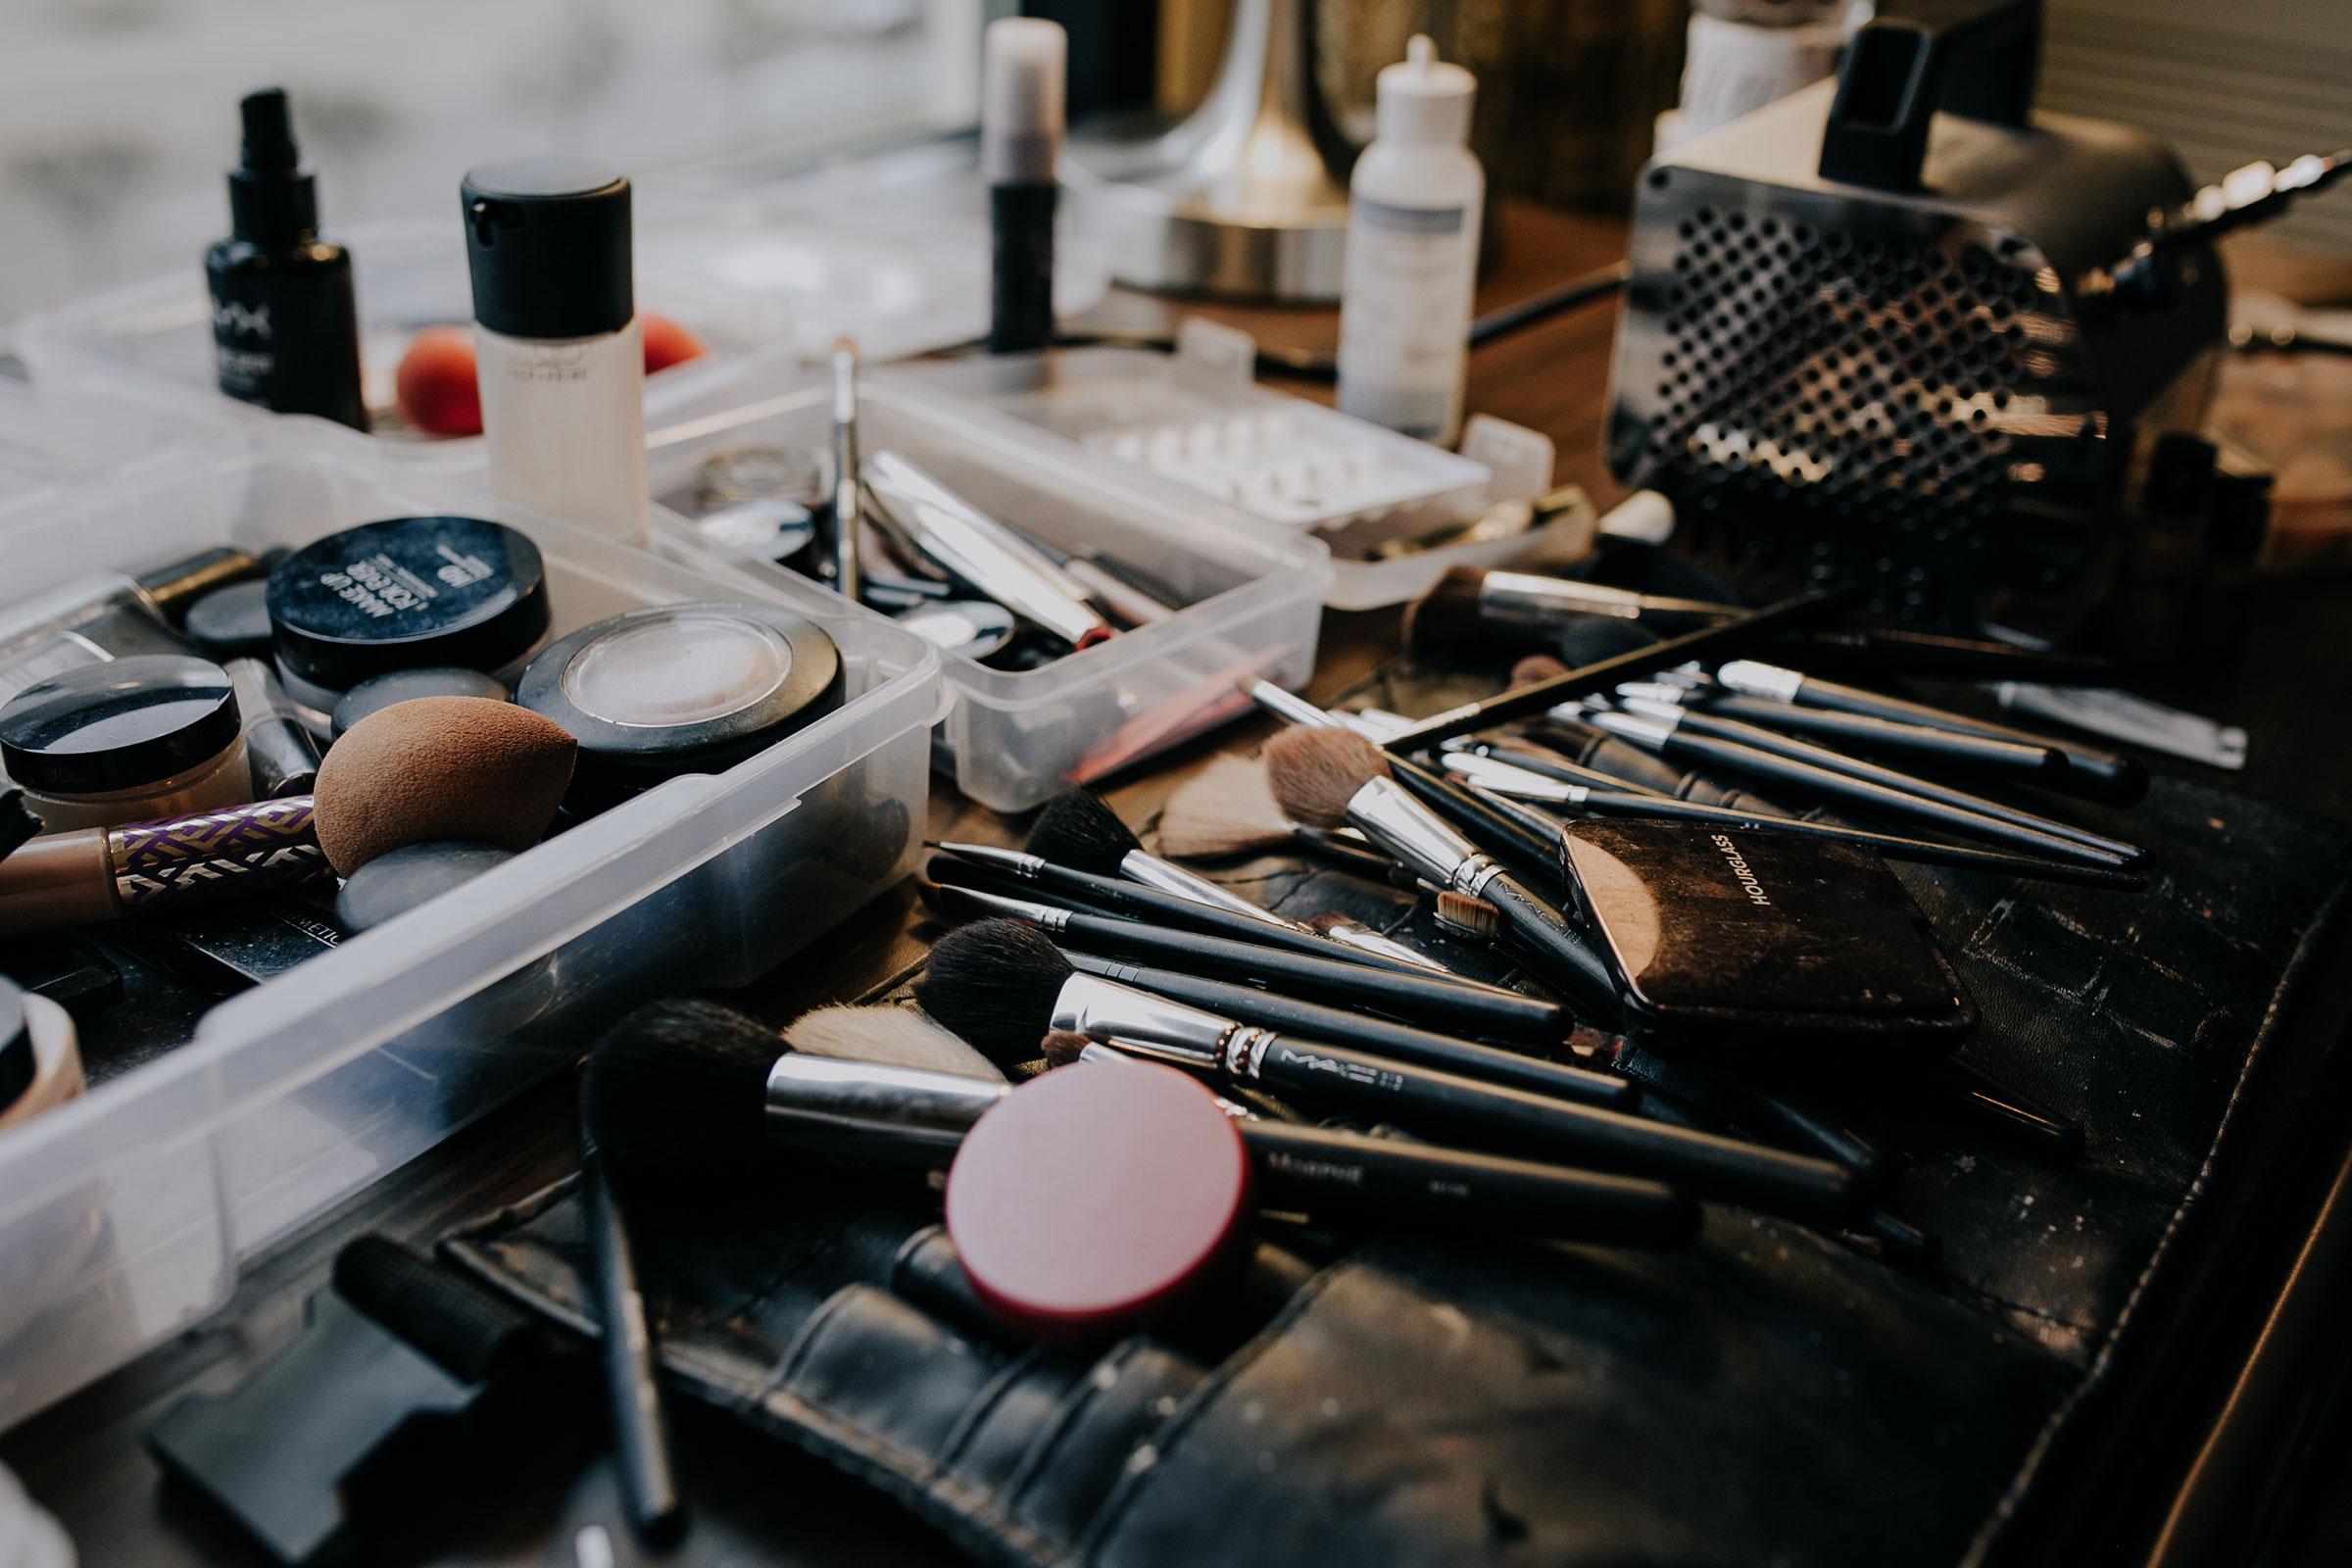 makeup-brushes-hilton-omaha-nebraska-raelyn-ramey-photography.jpg